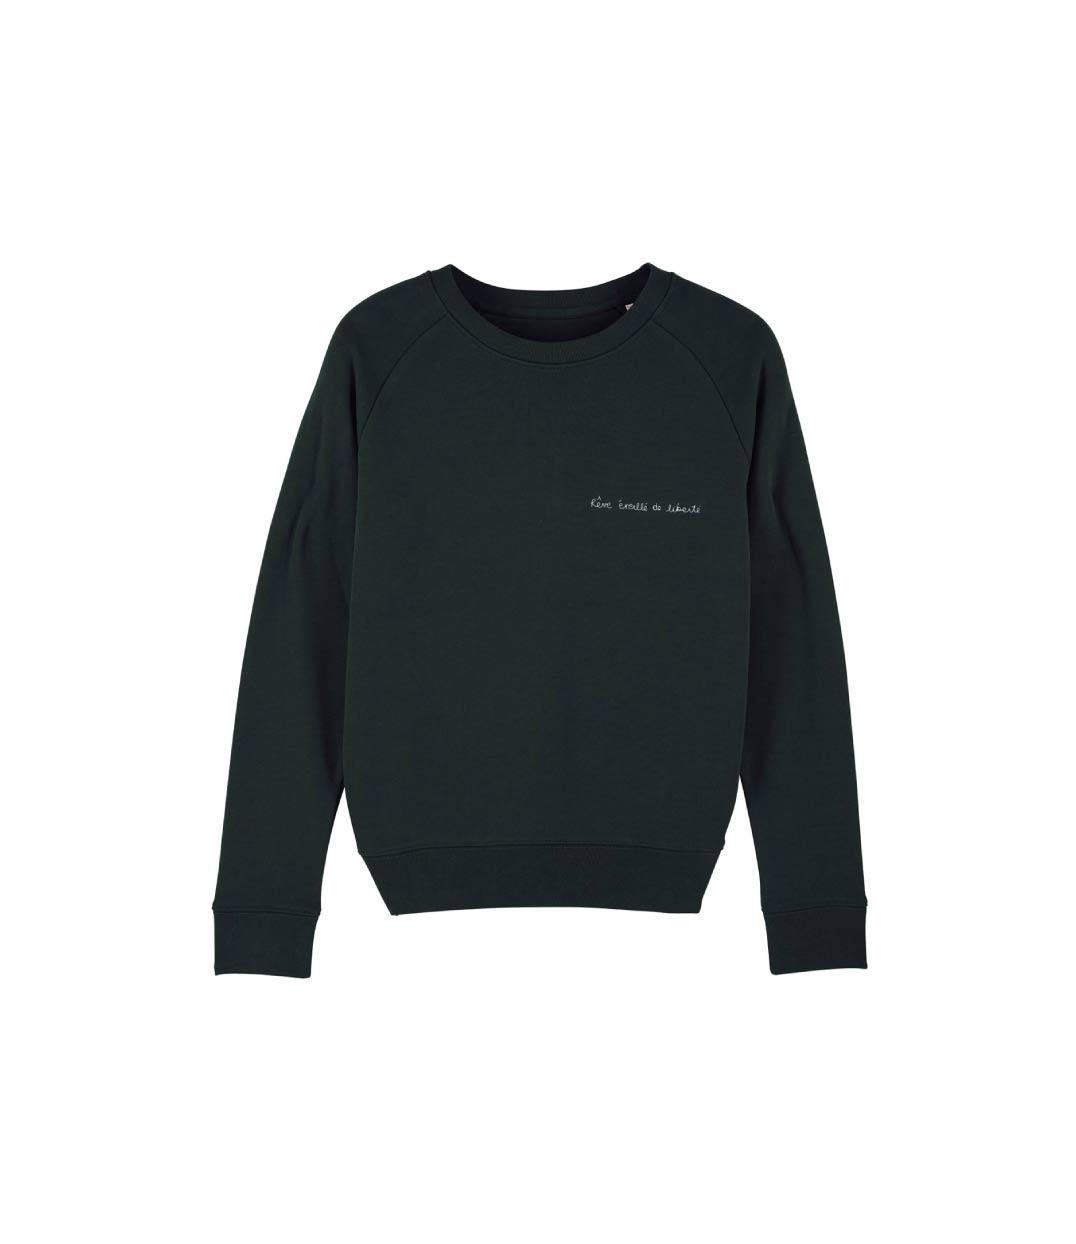 mockup sweatshirt noir avec citation devant